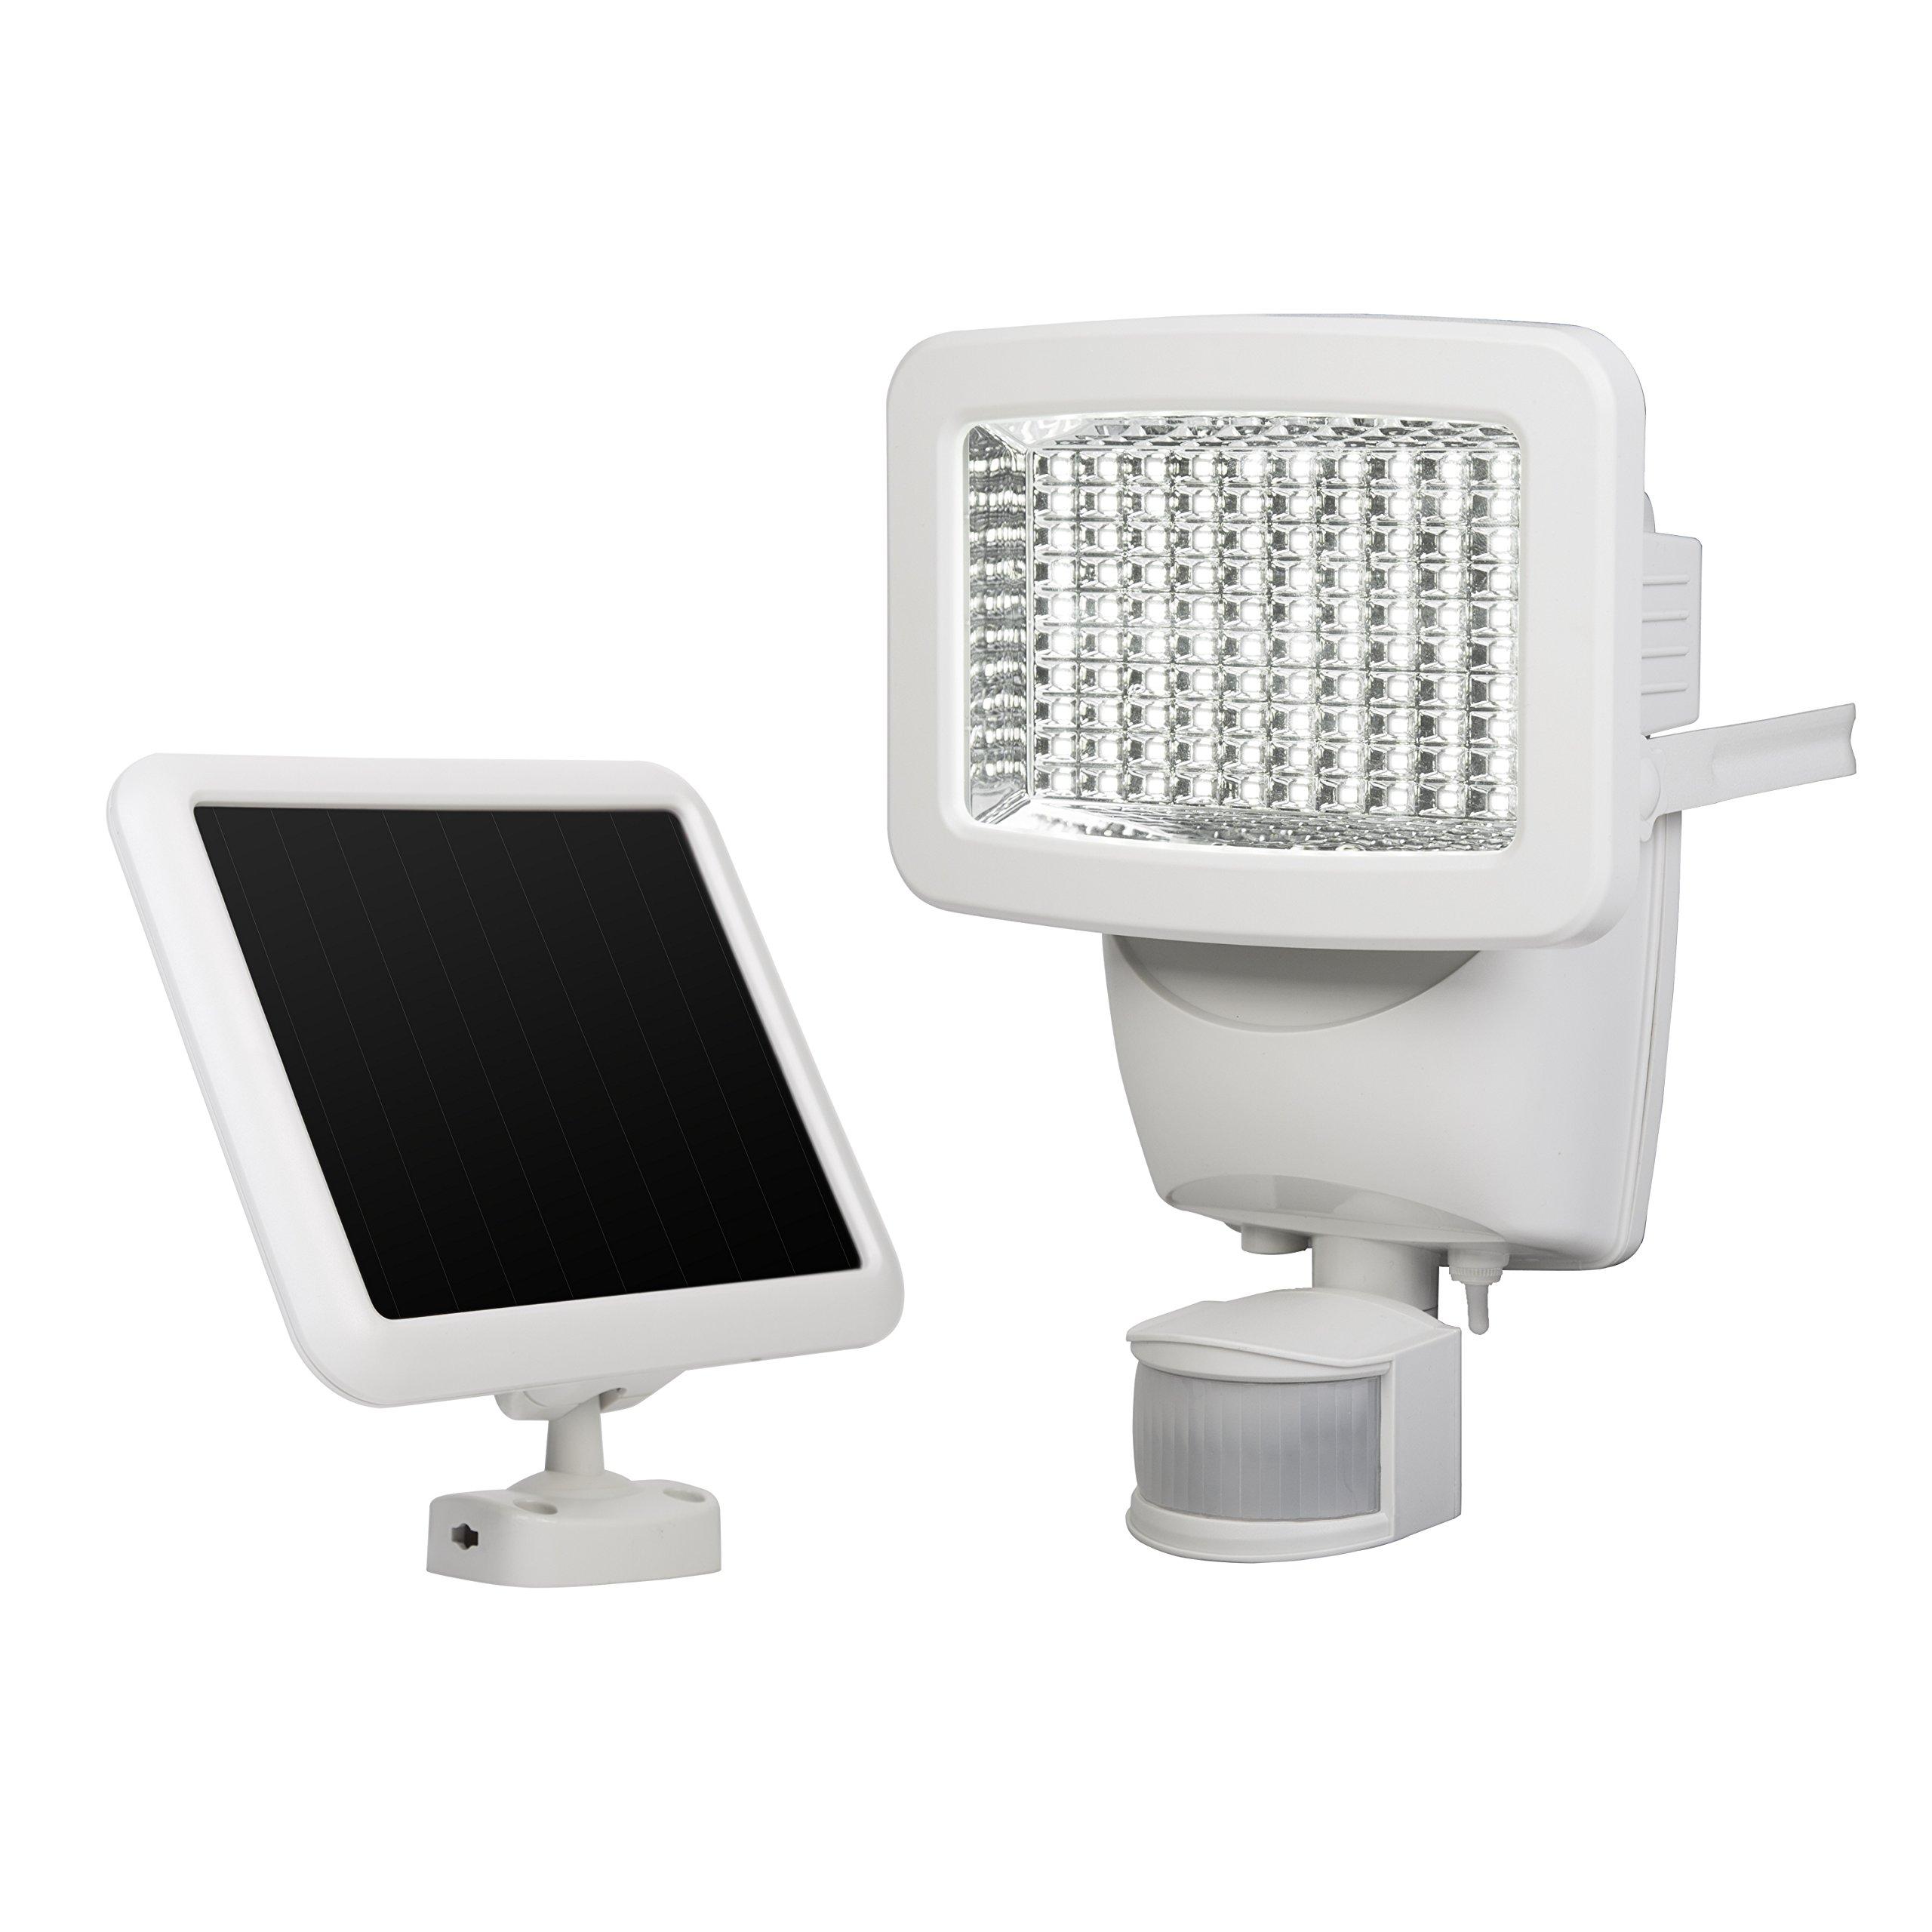 Sunforce 82101 100 LED Solar Motion Light by Sunforce